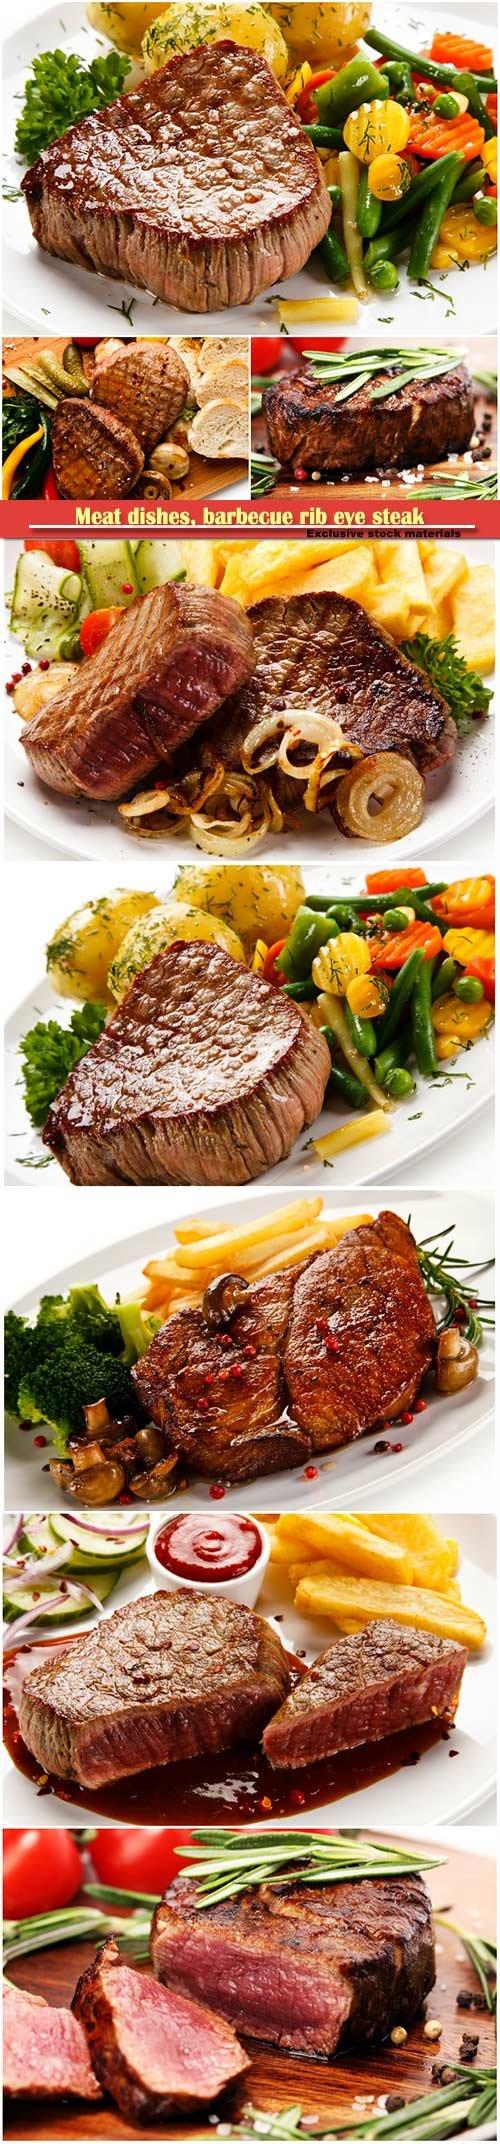 Meat dishes, barbecue rib eye steak, tenderloin filet mignon